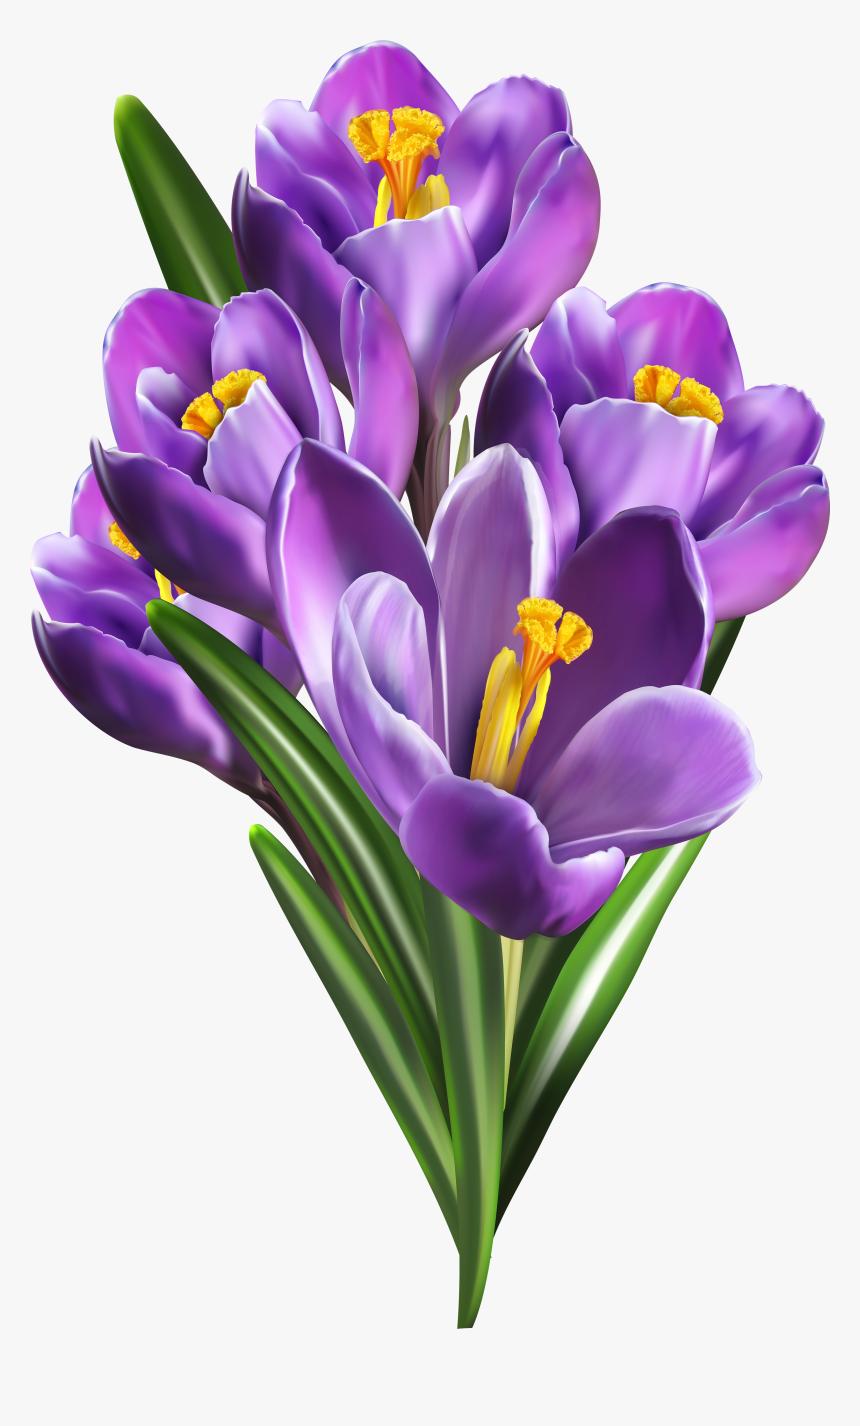 Clipart Spring Crocus - Saffron Flower Png, Transparent Png, Free Download